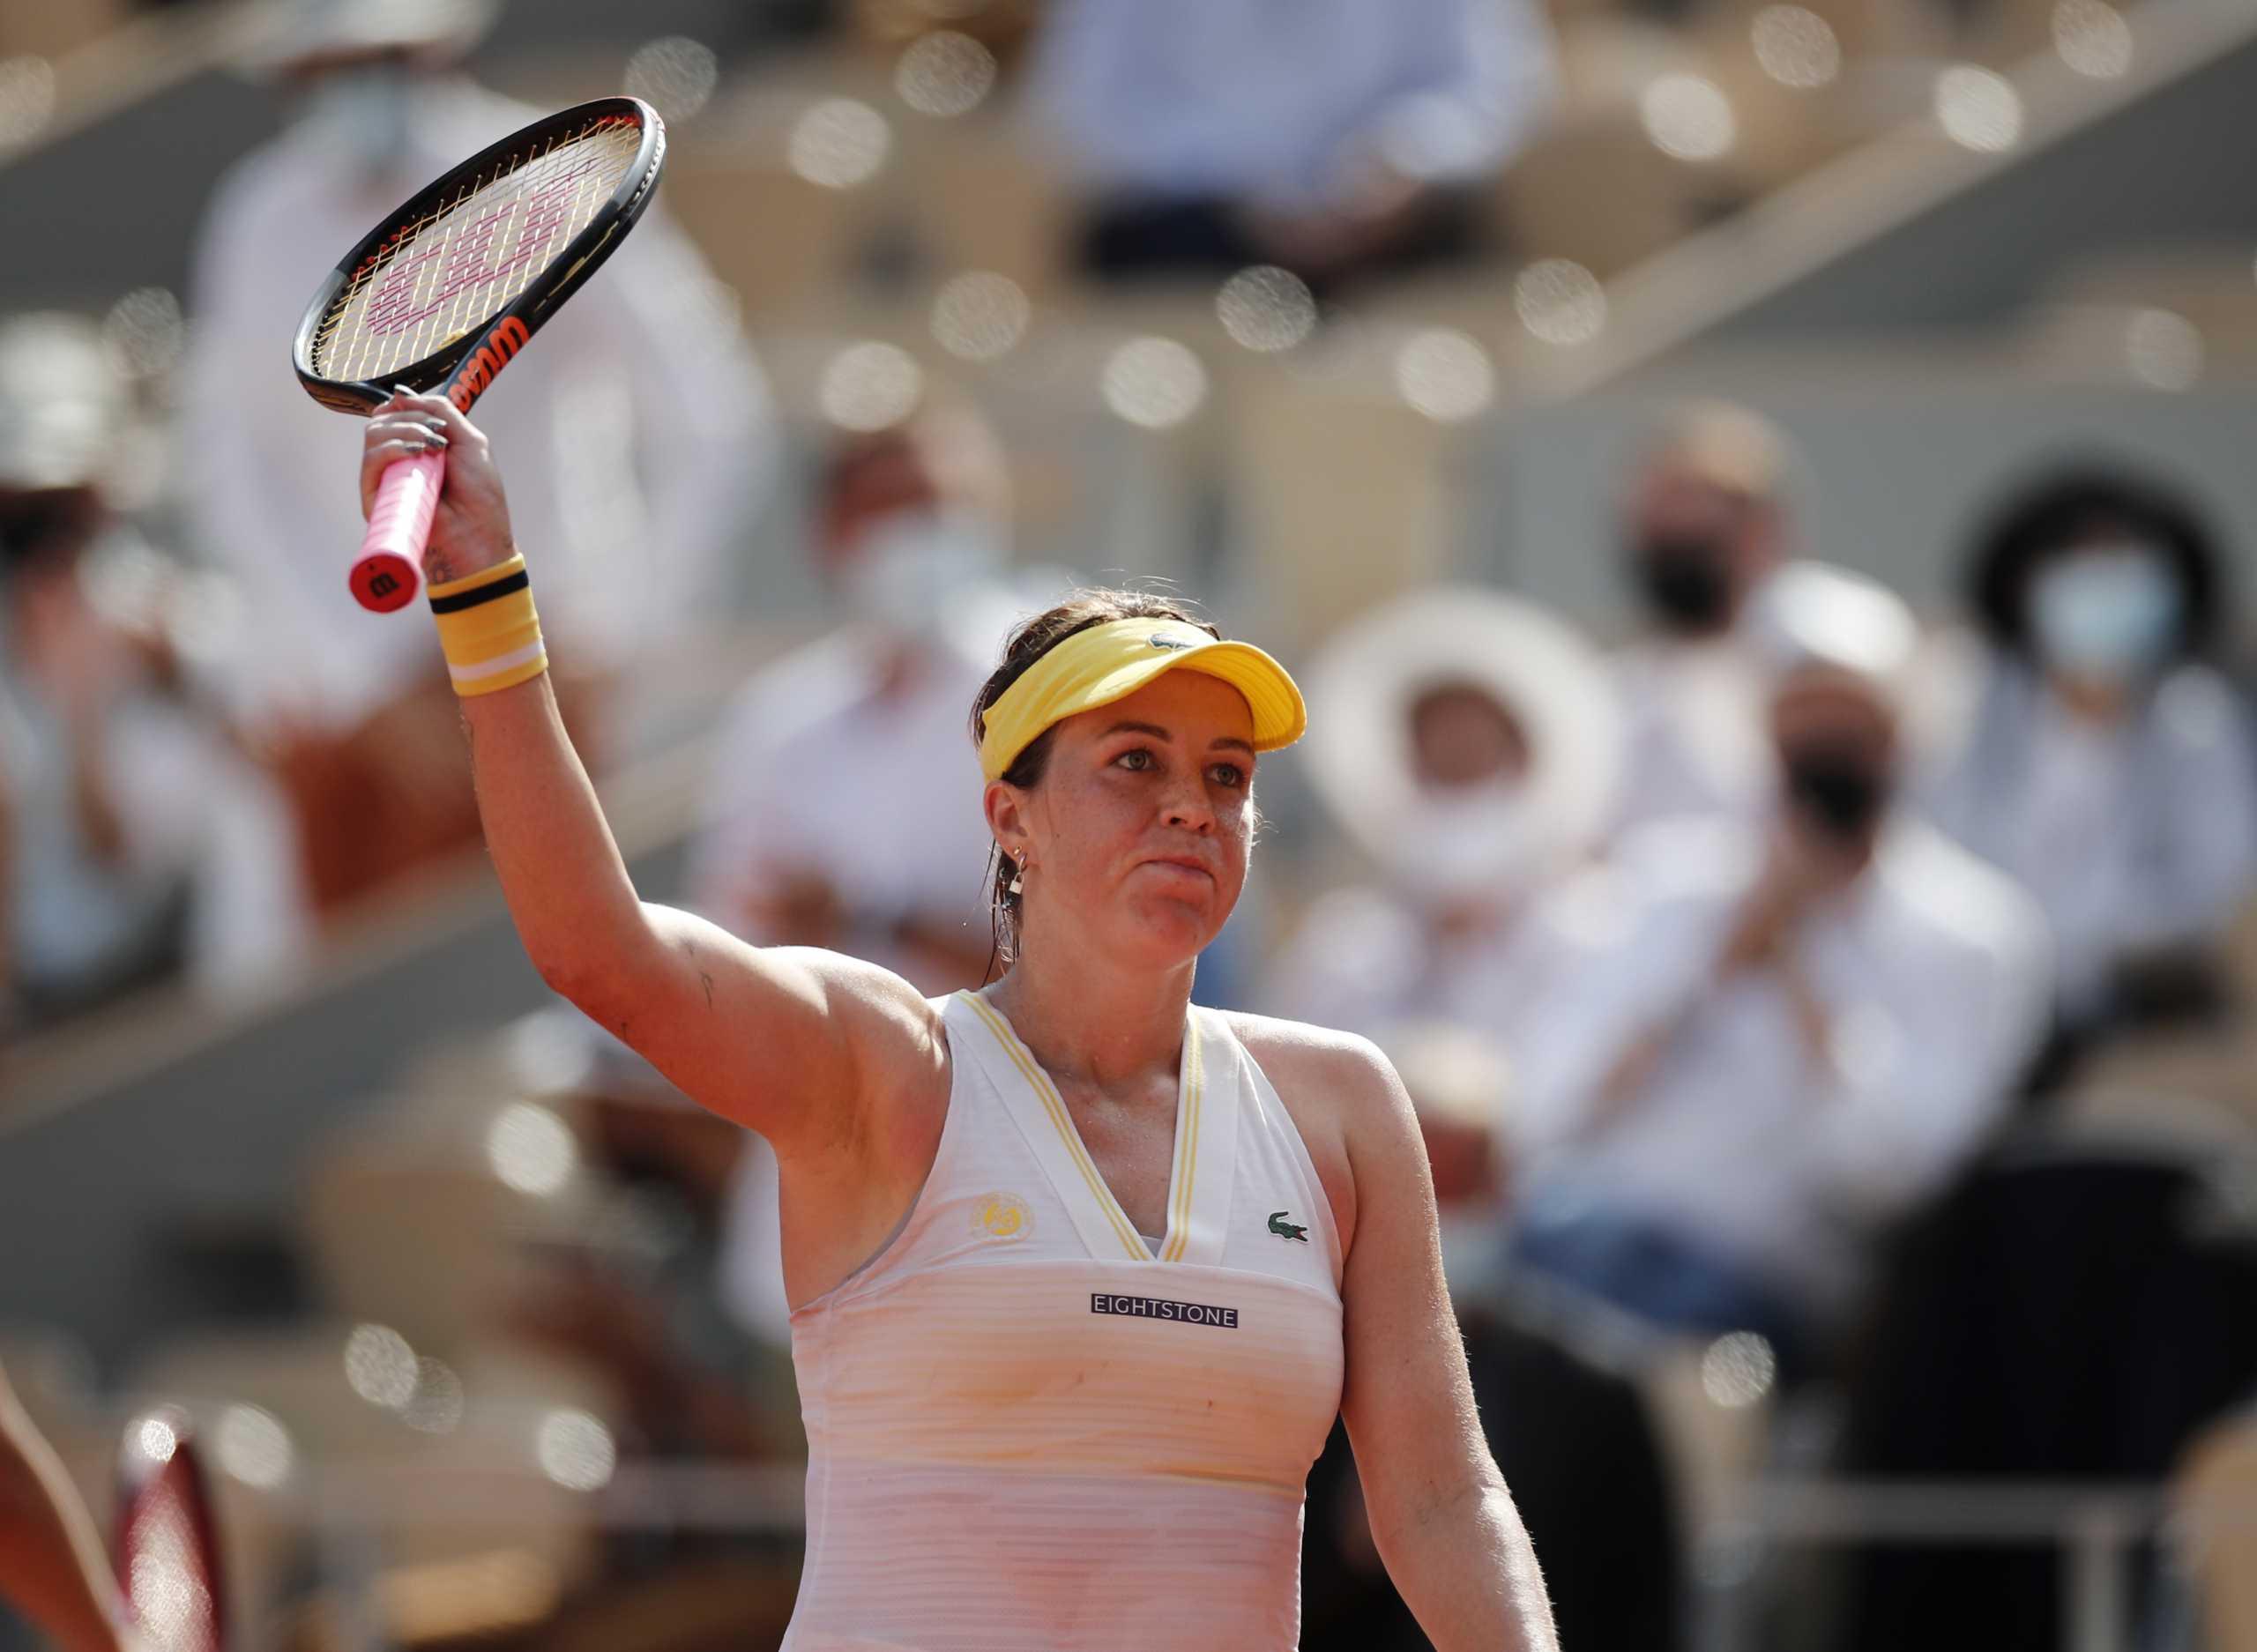 Roland Garros: Στα ημιτελικά η Παβλιουτσένκοβα